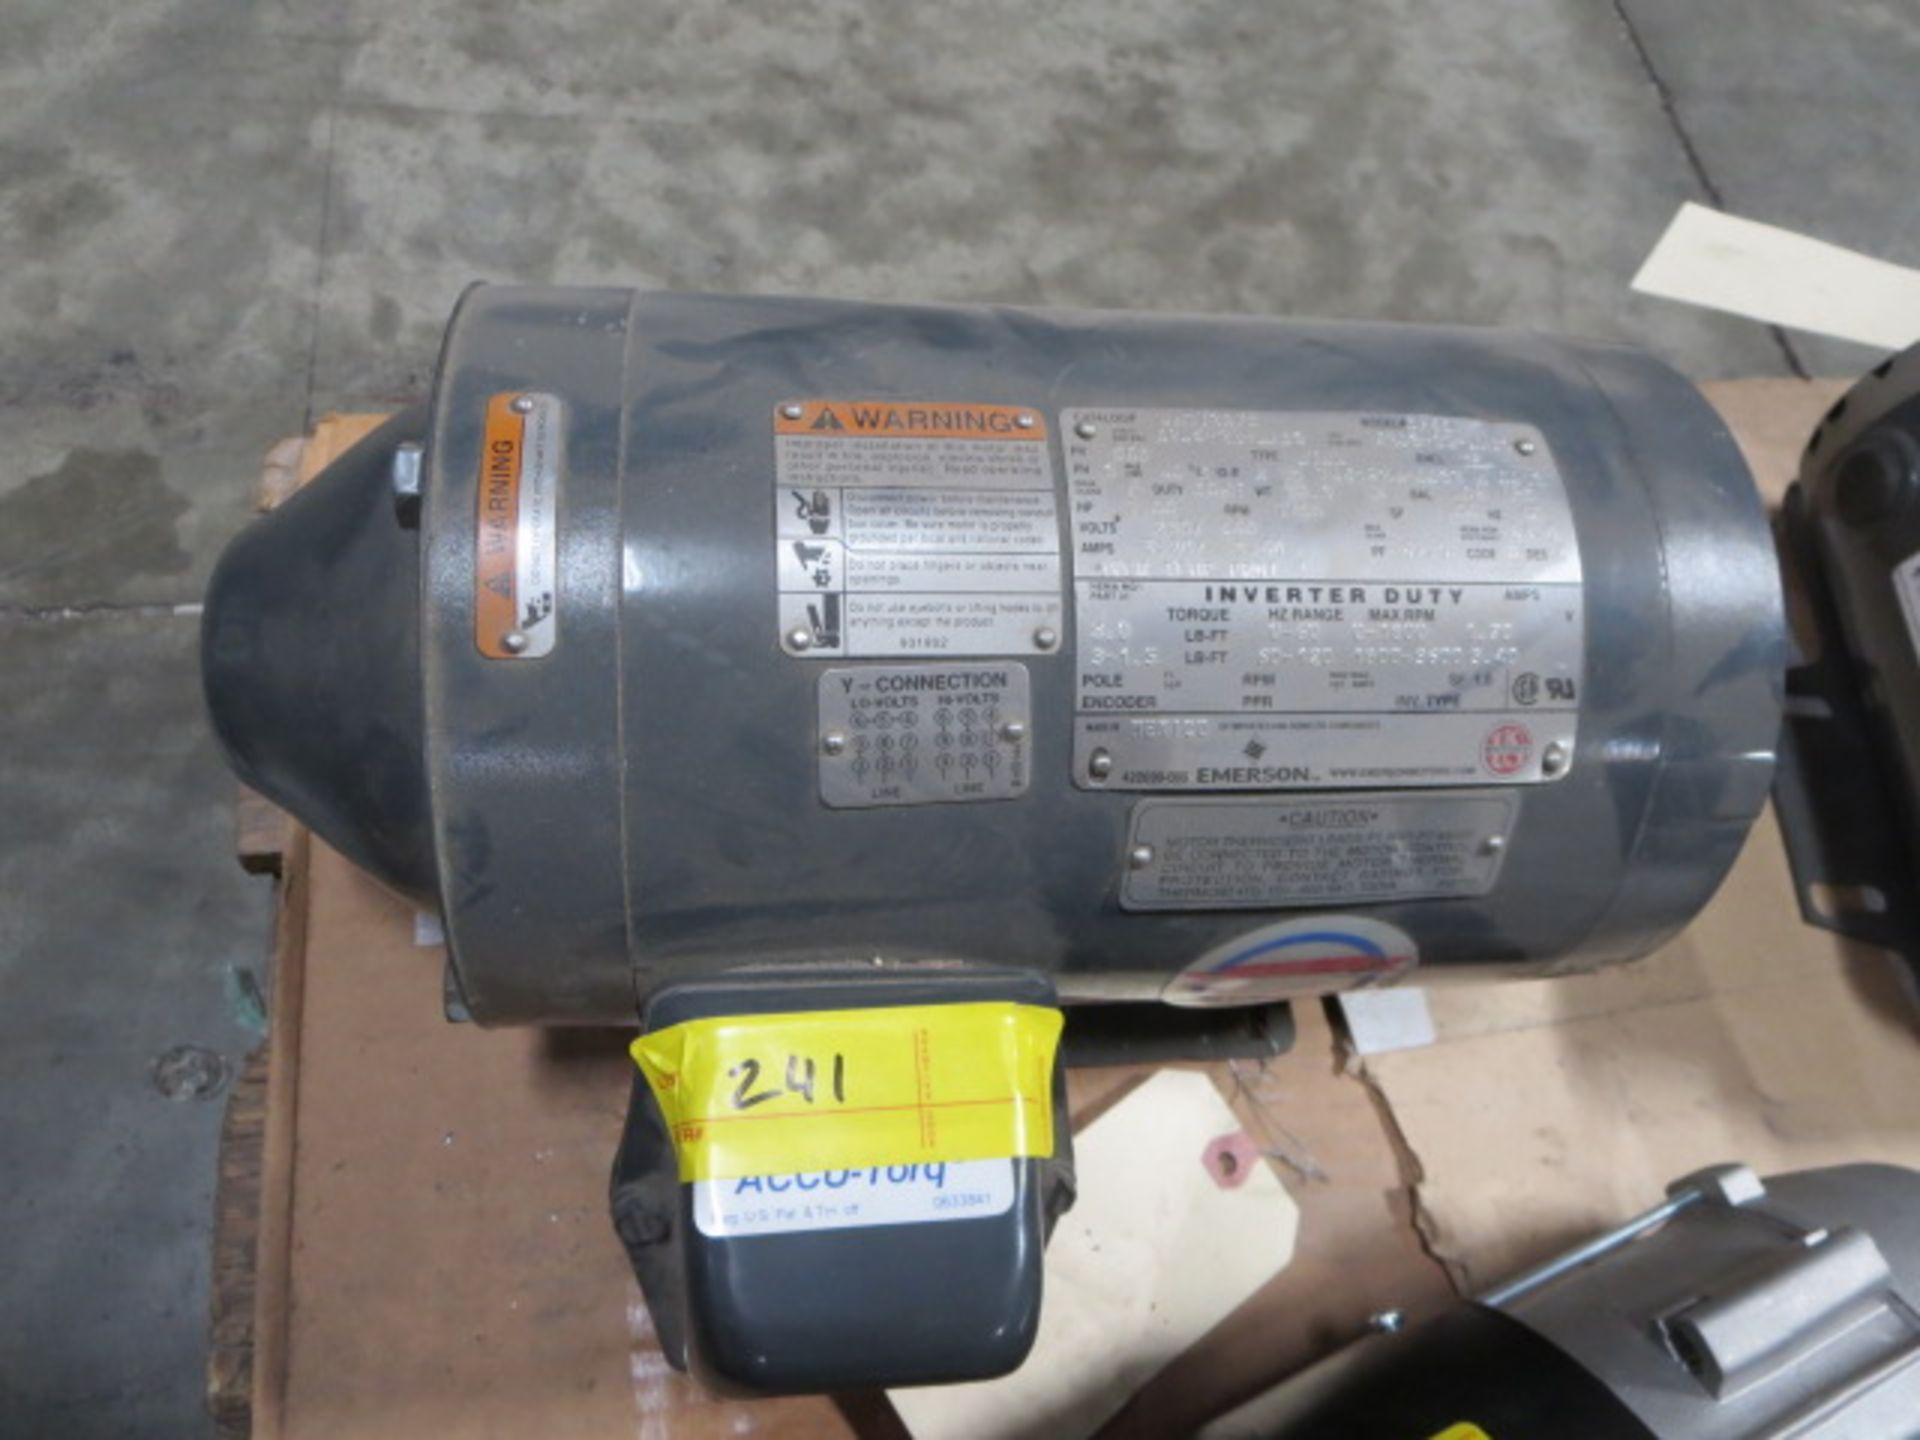 Lot 241 - US Motors Inverter Duty Motor, 3 Phase, 60Hz